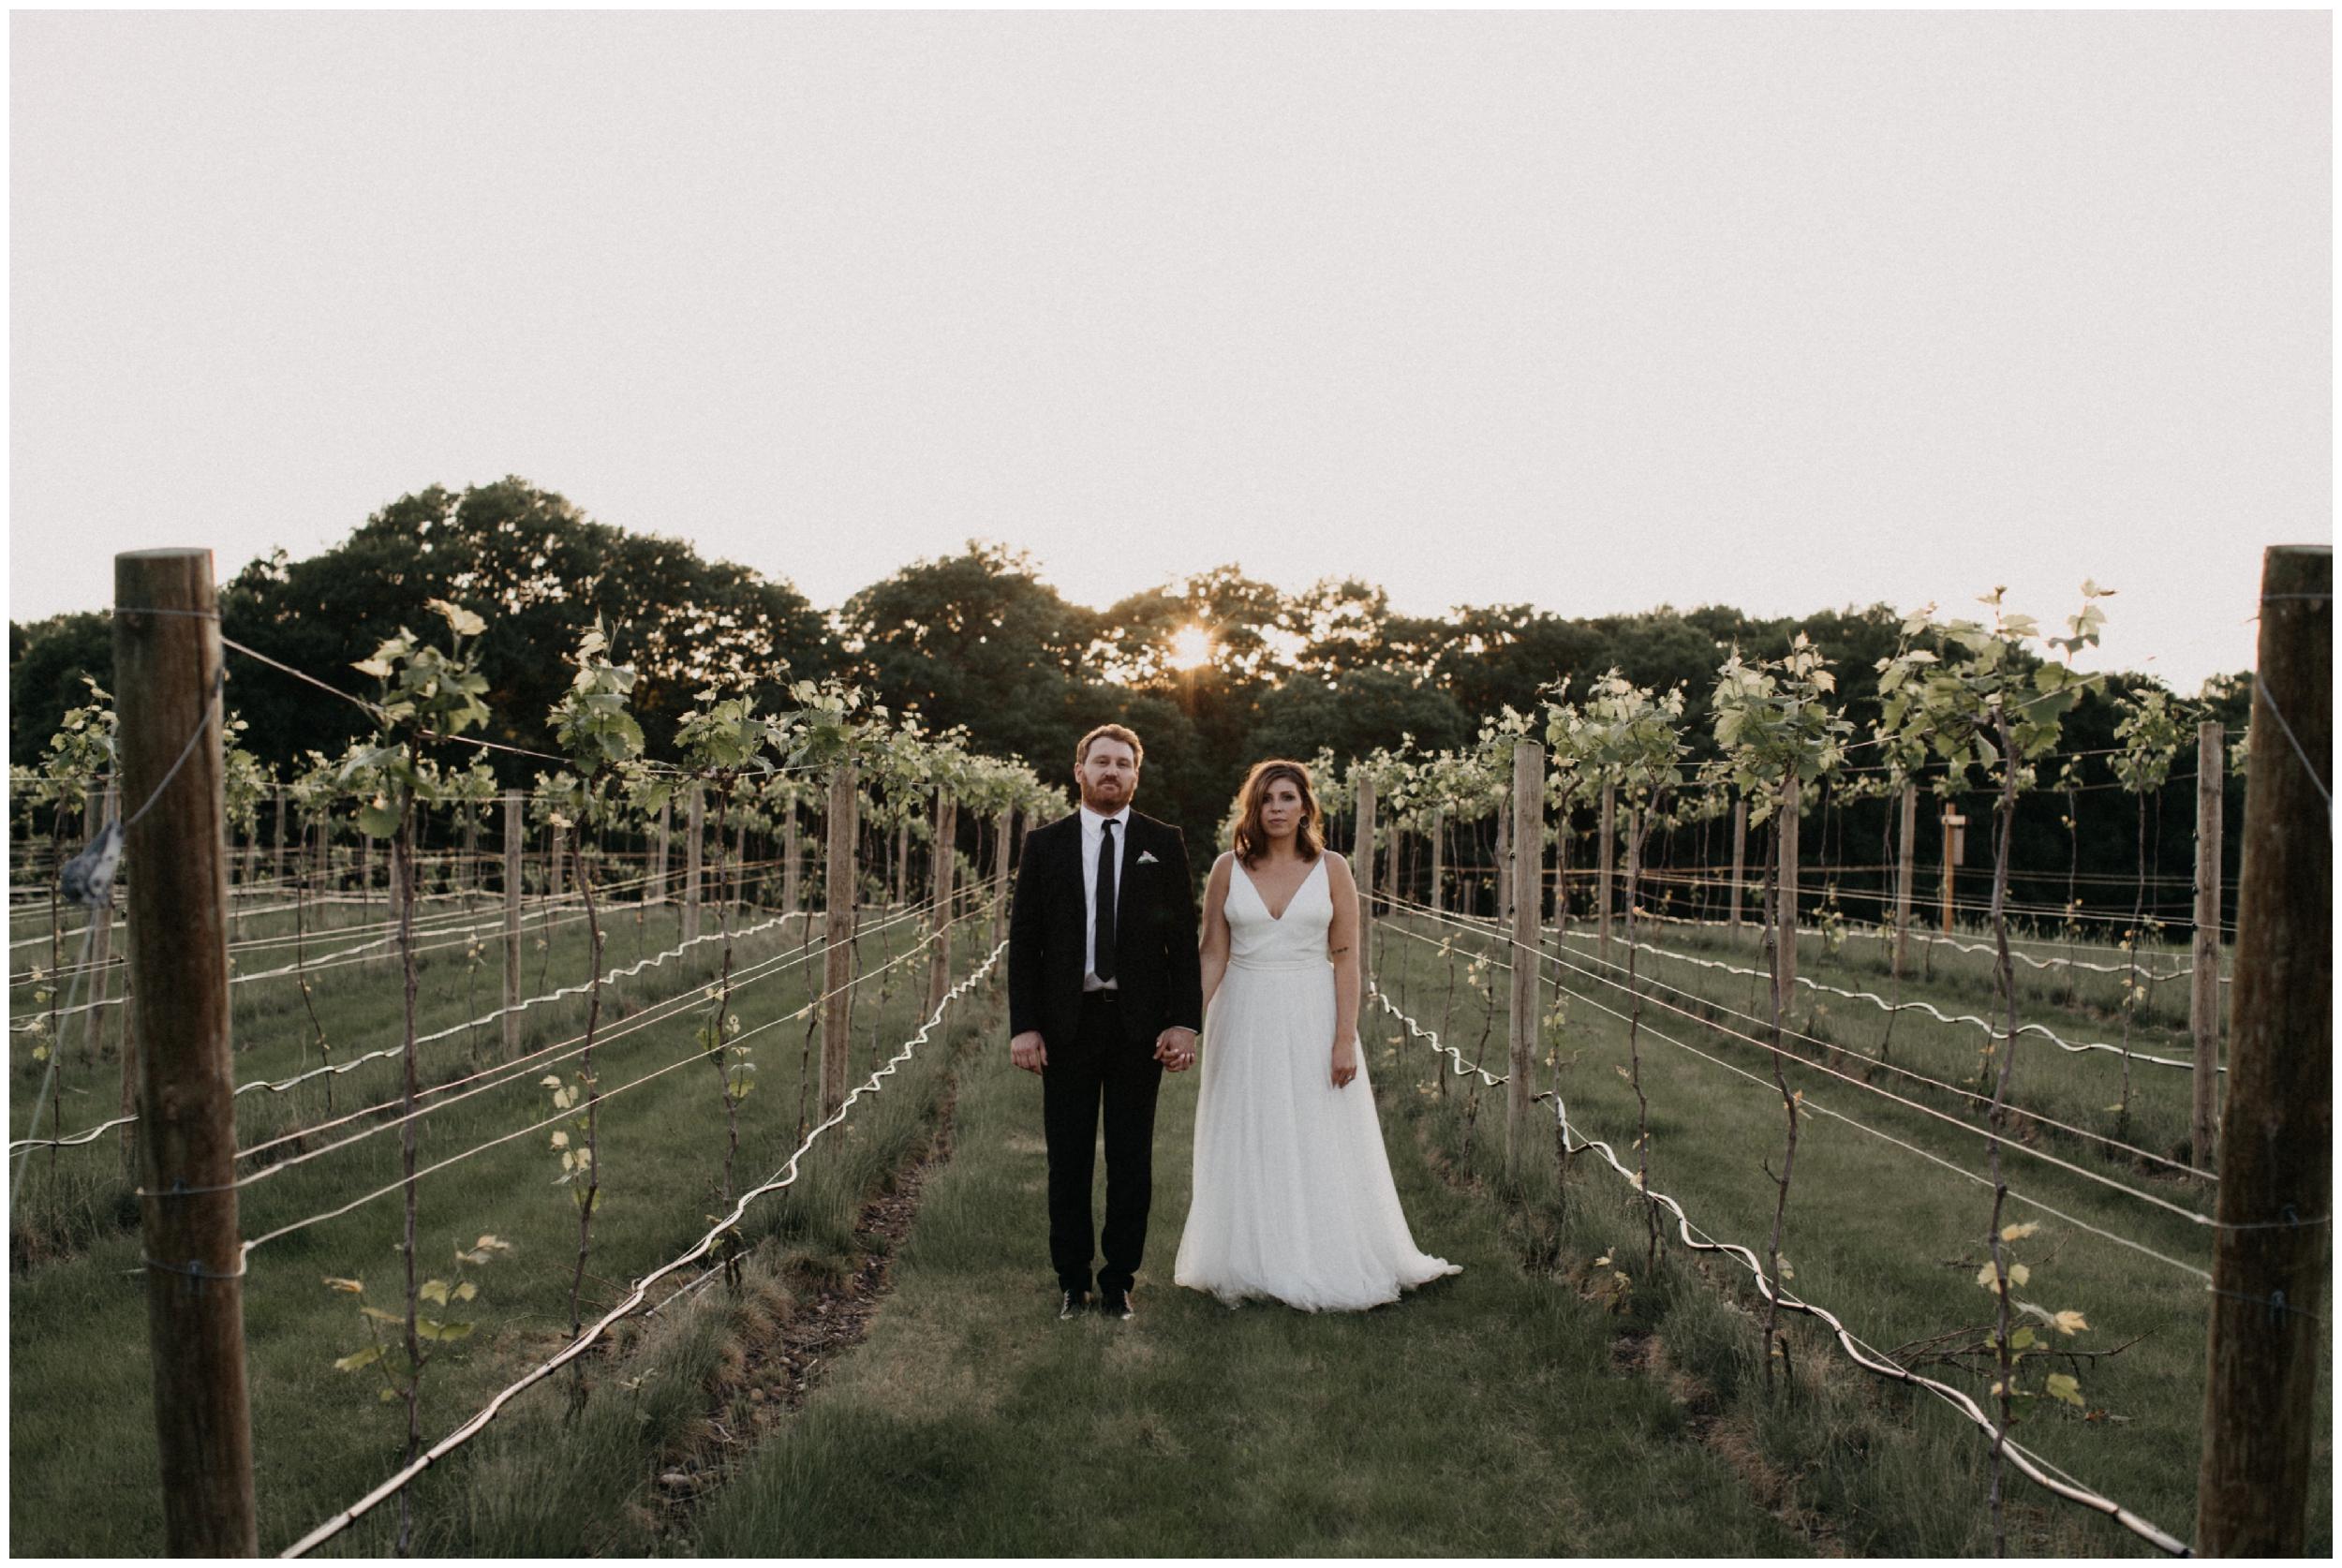 Vineyard wedding in Minnesota photographed by Britt DeZeeuw